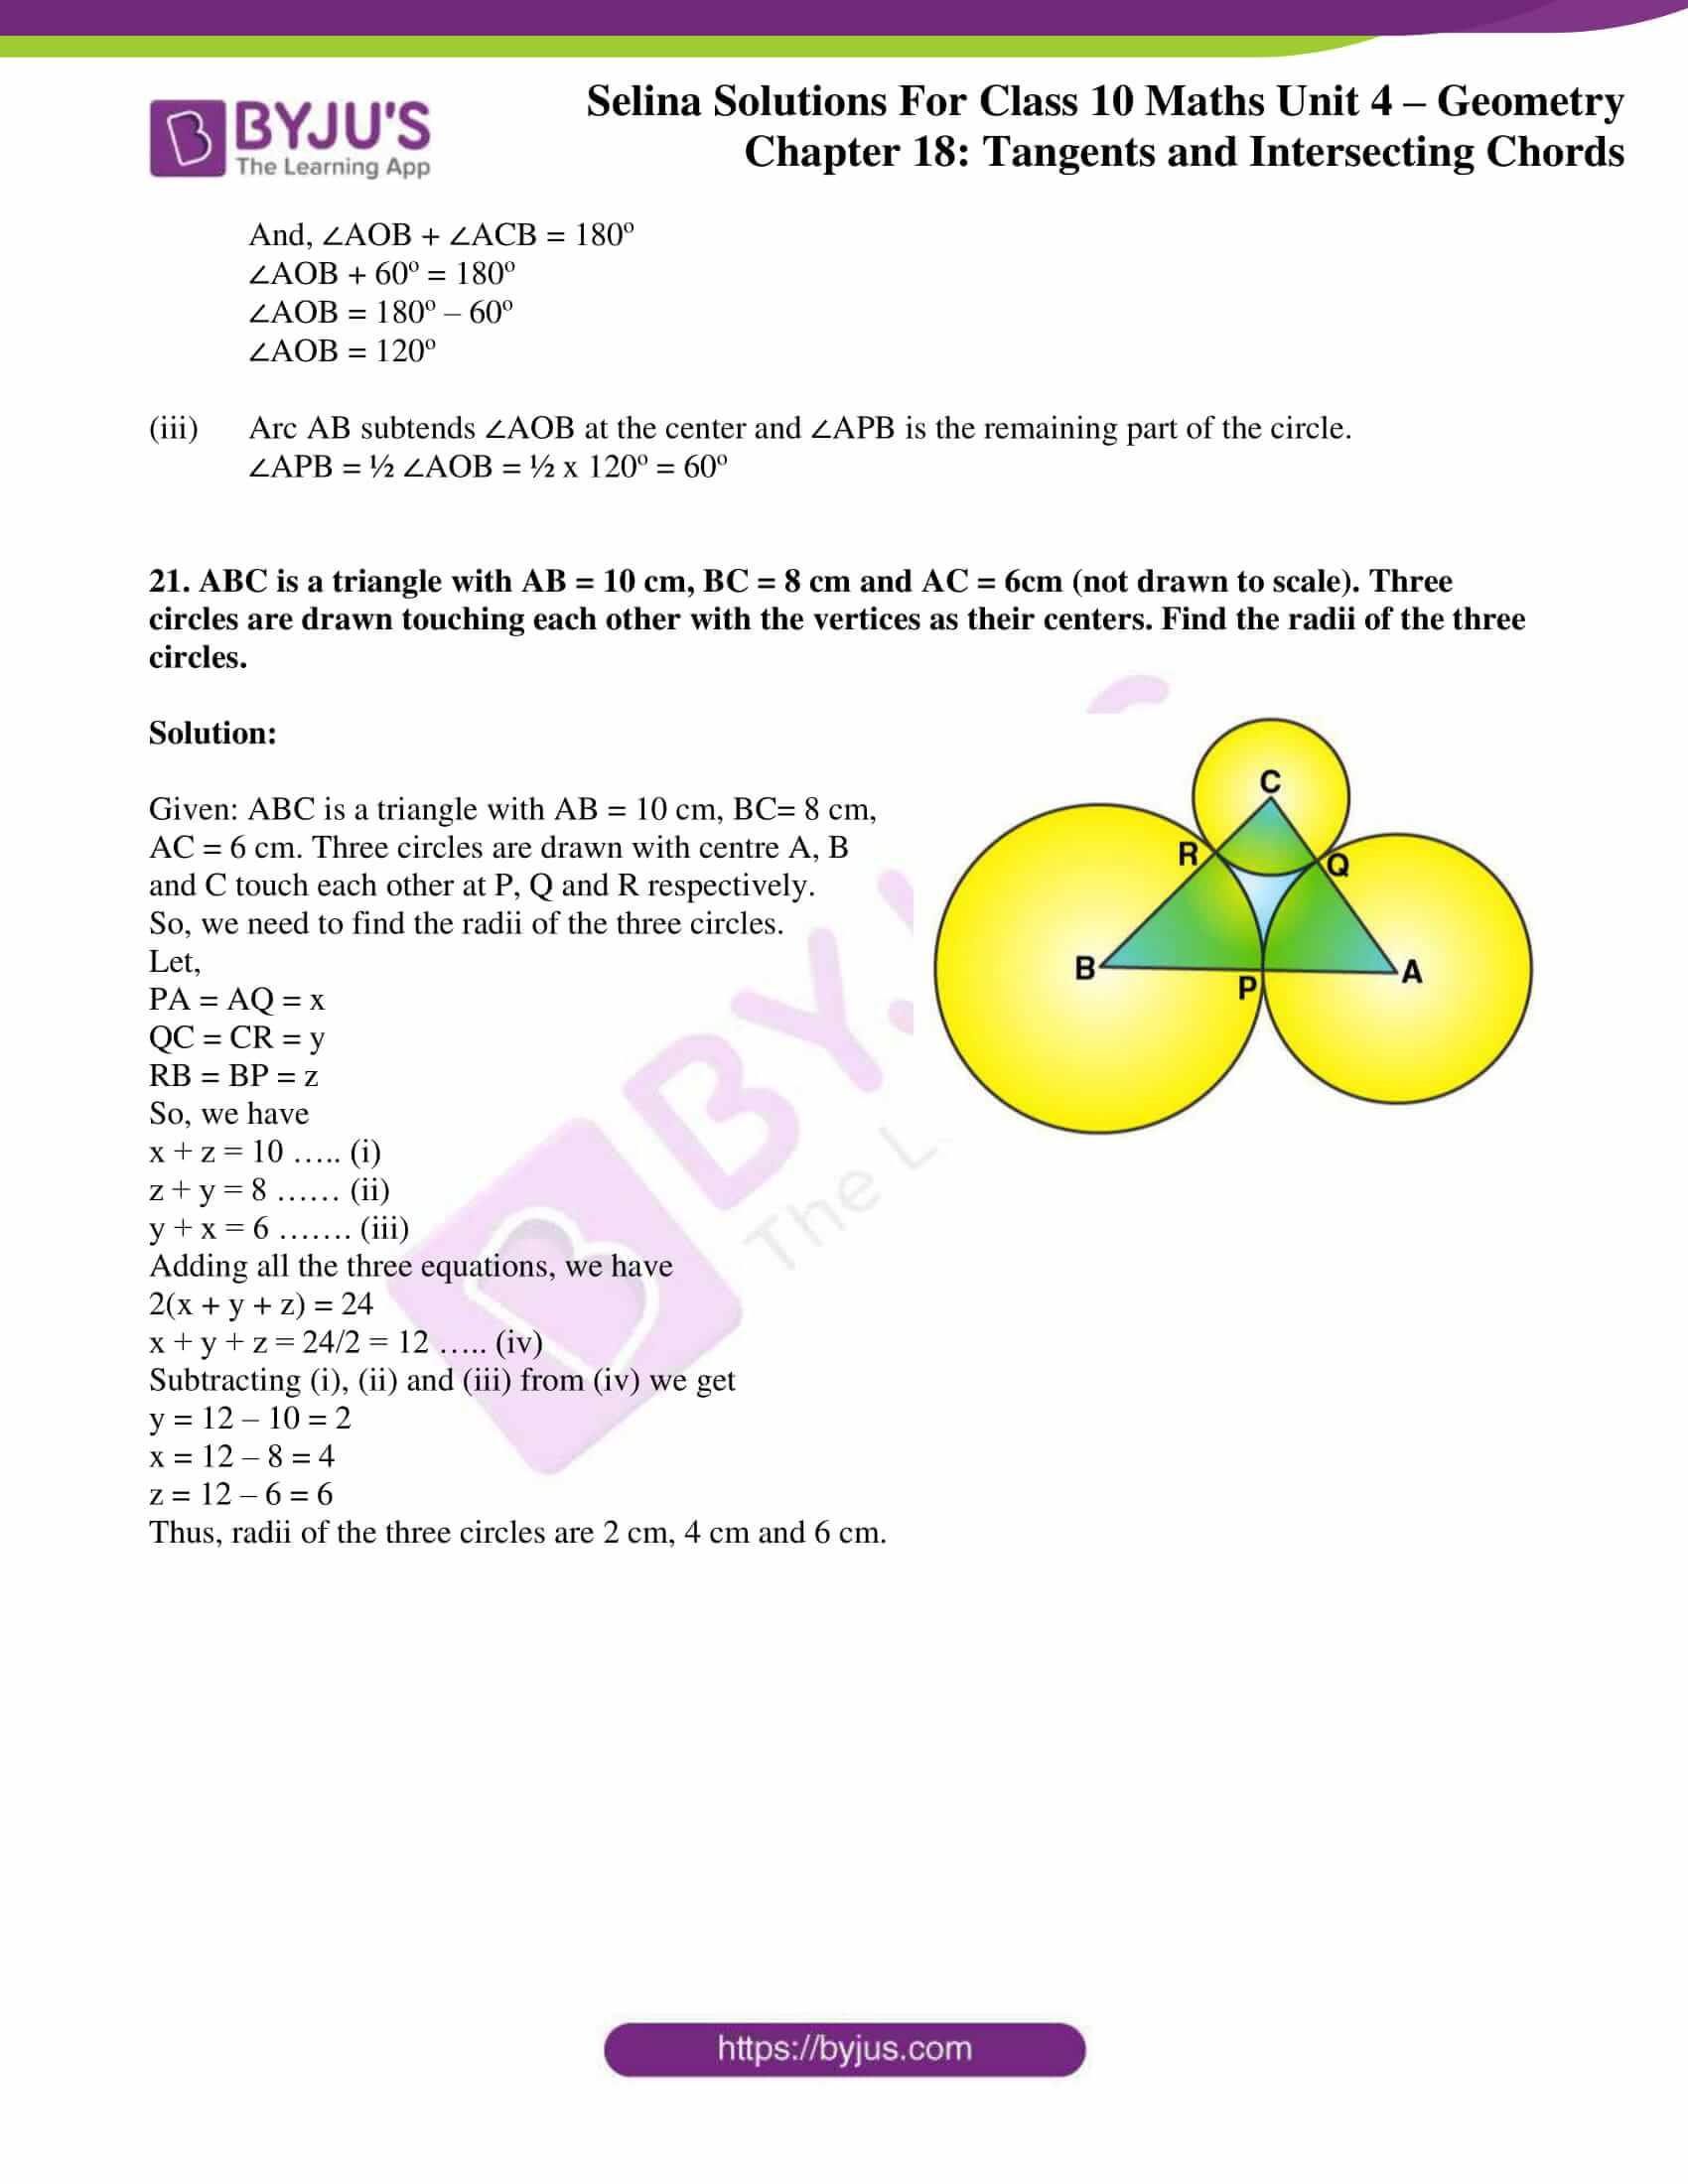 selina-sol-maths-class-10-ch-18-ex-c-12